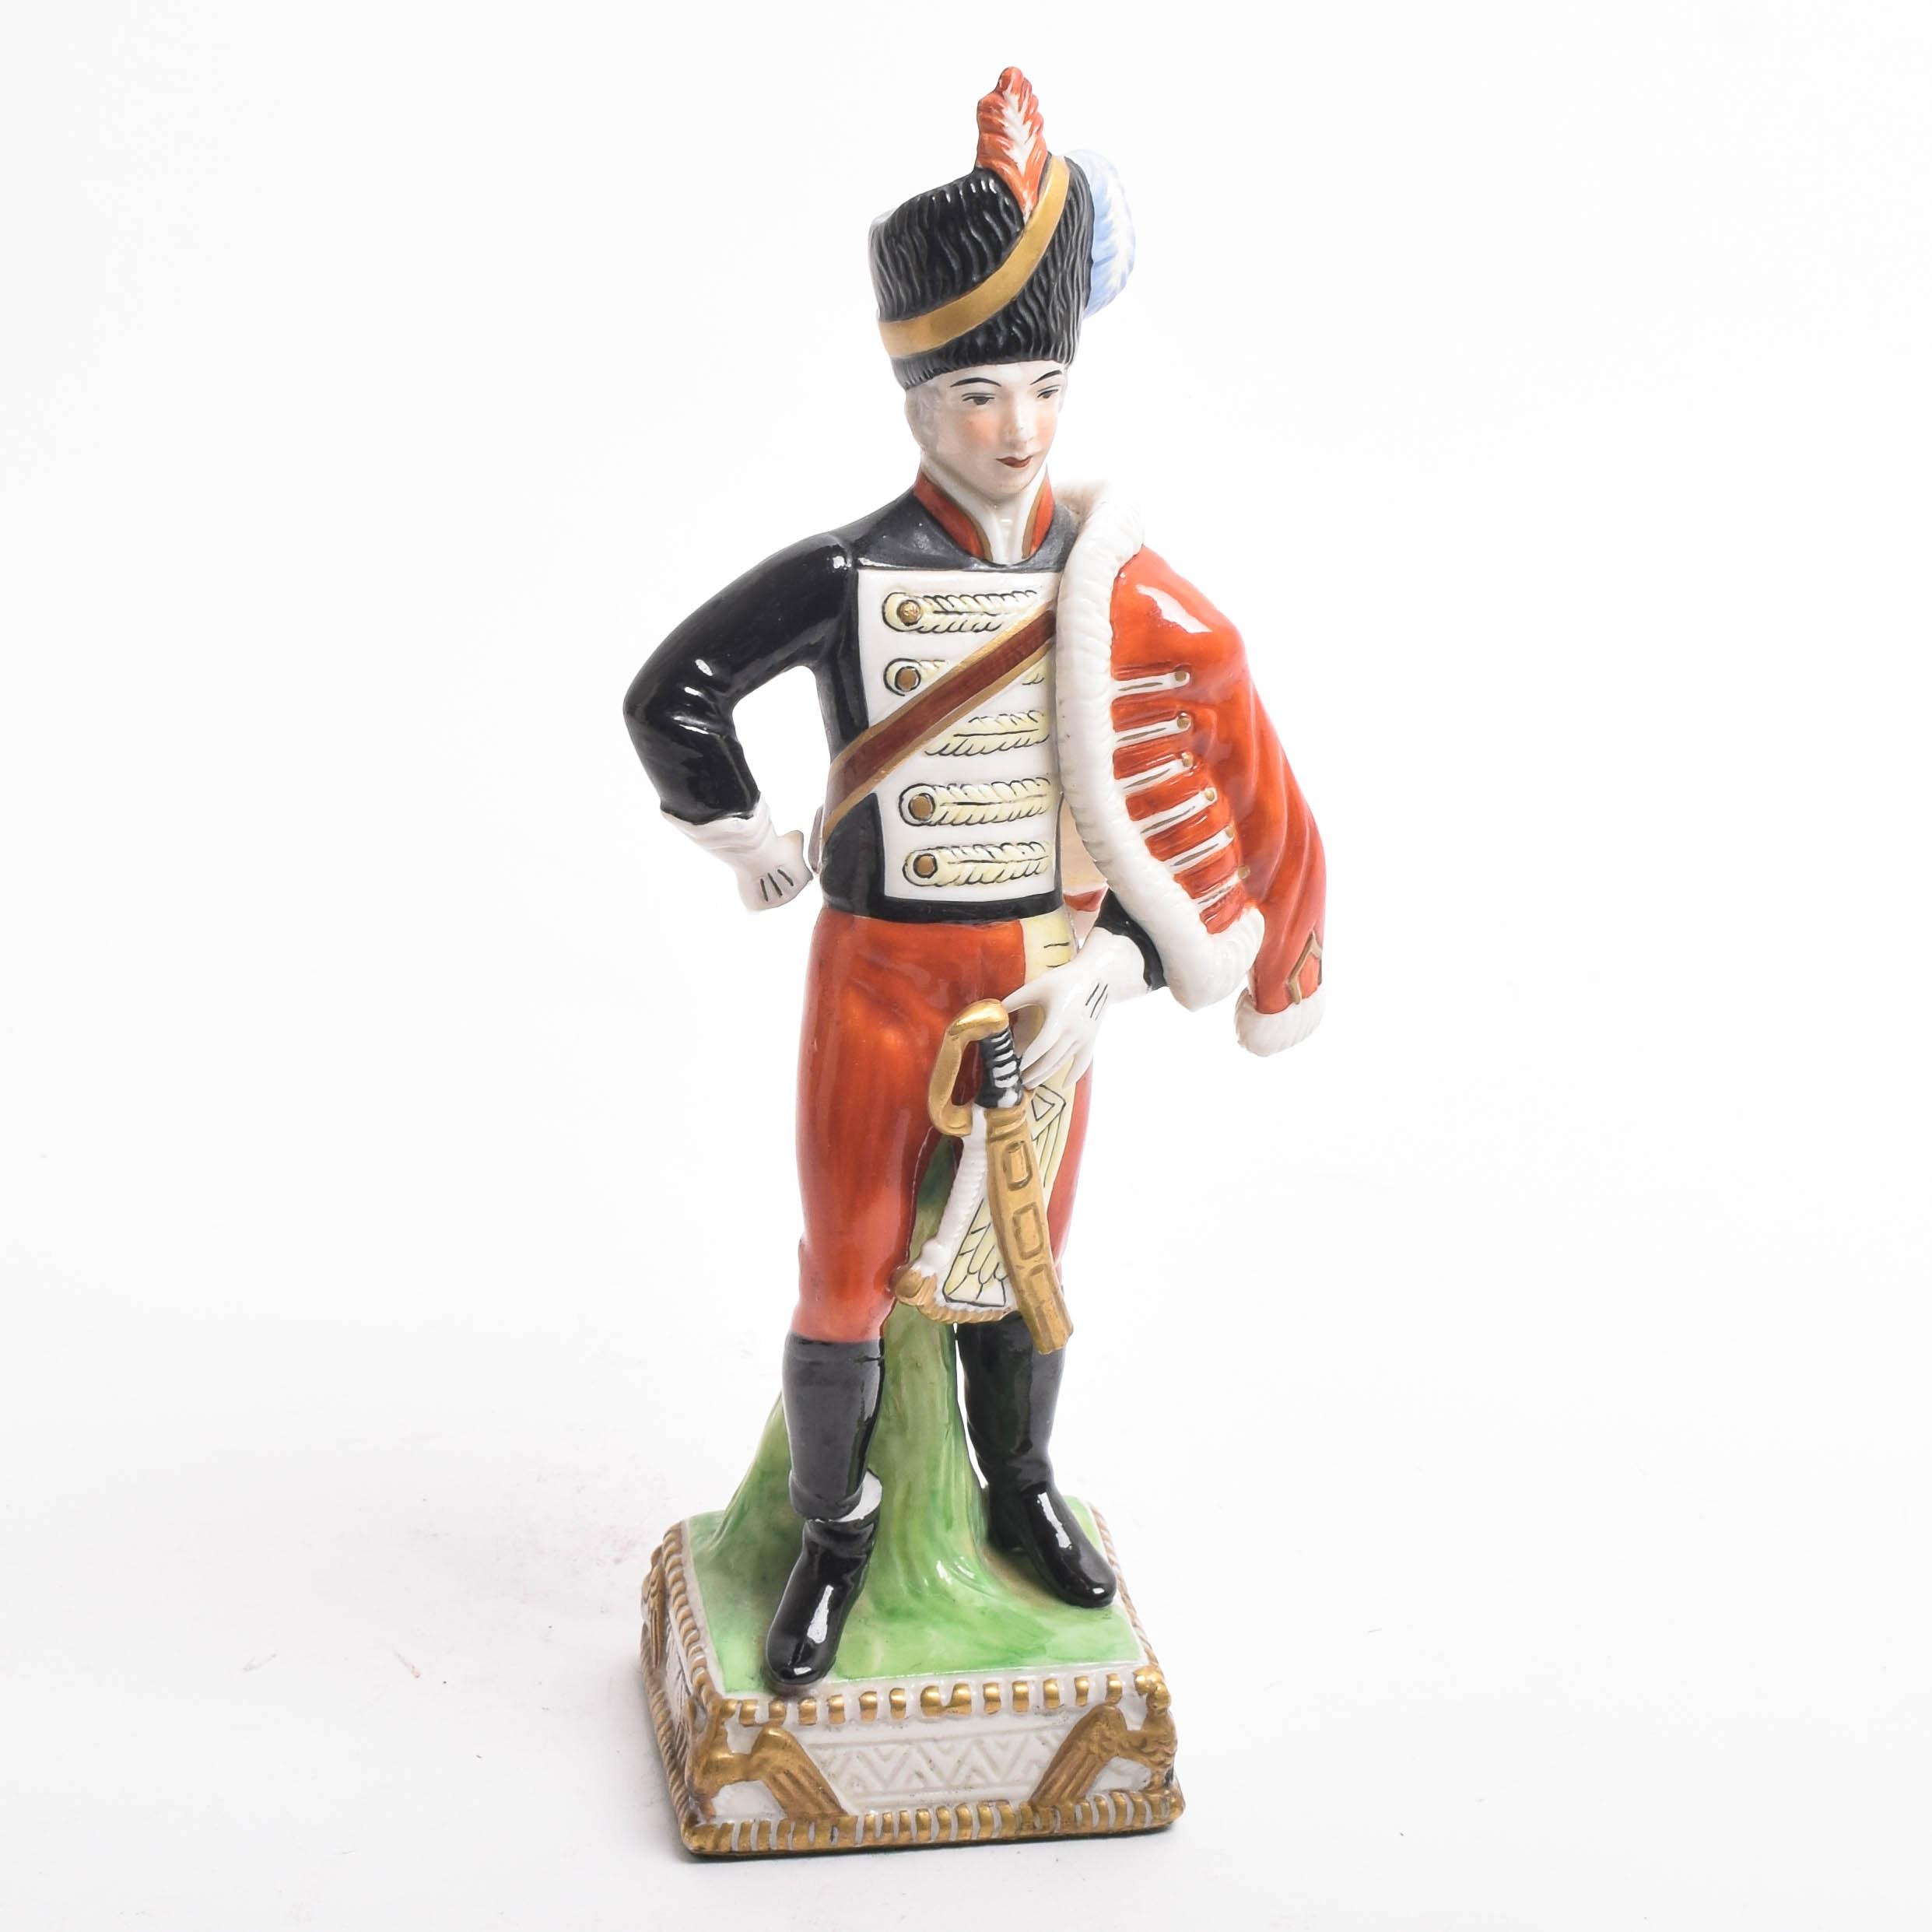 Porcelain Napoleonic Soldier Figurine